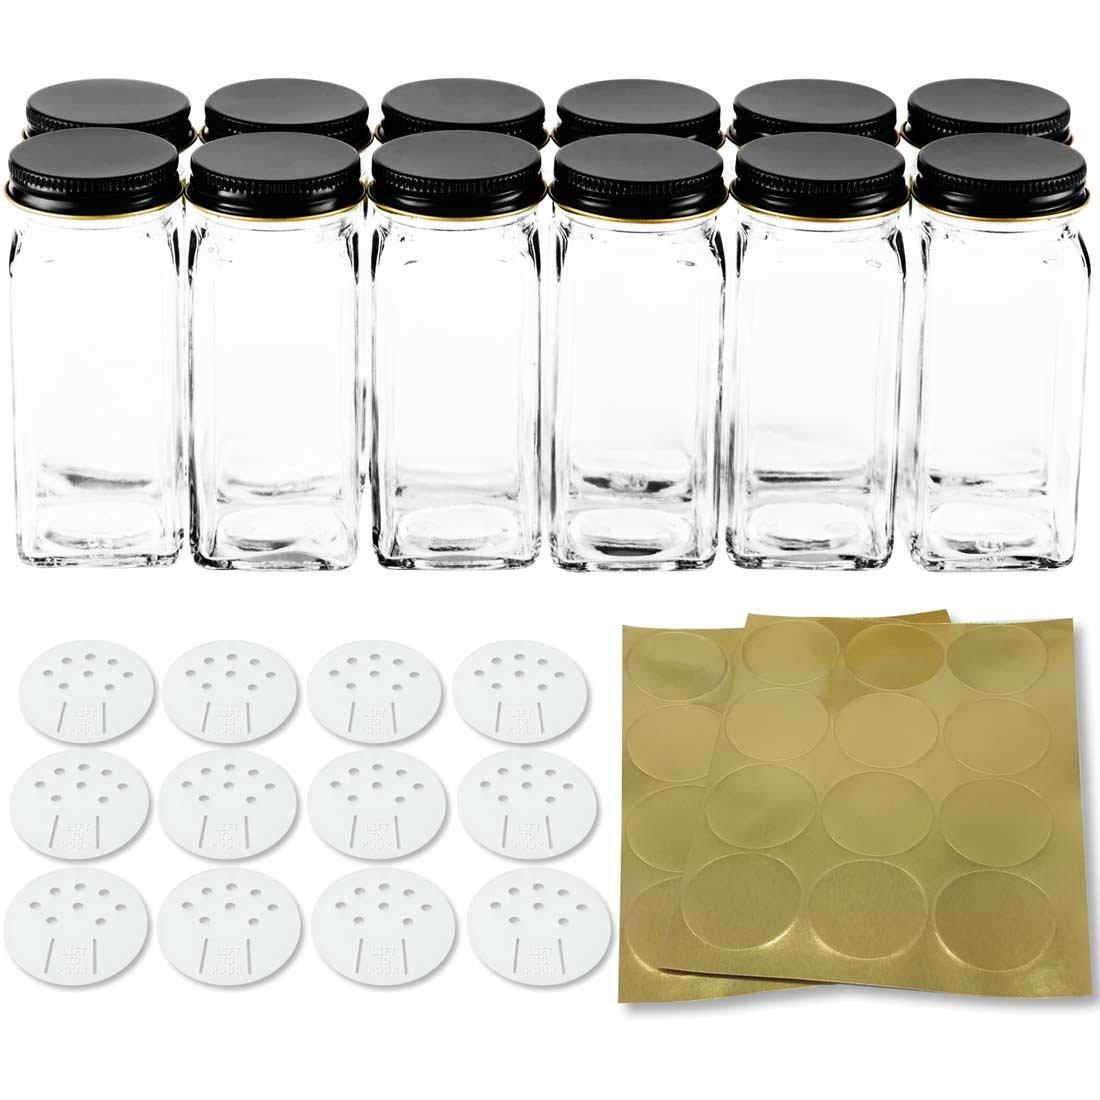 Amazon.com: 12 Square Glass Spice Bottles 4 oz Spice Jars with ...